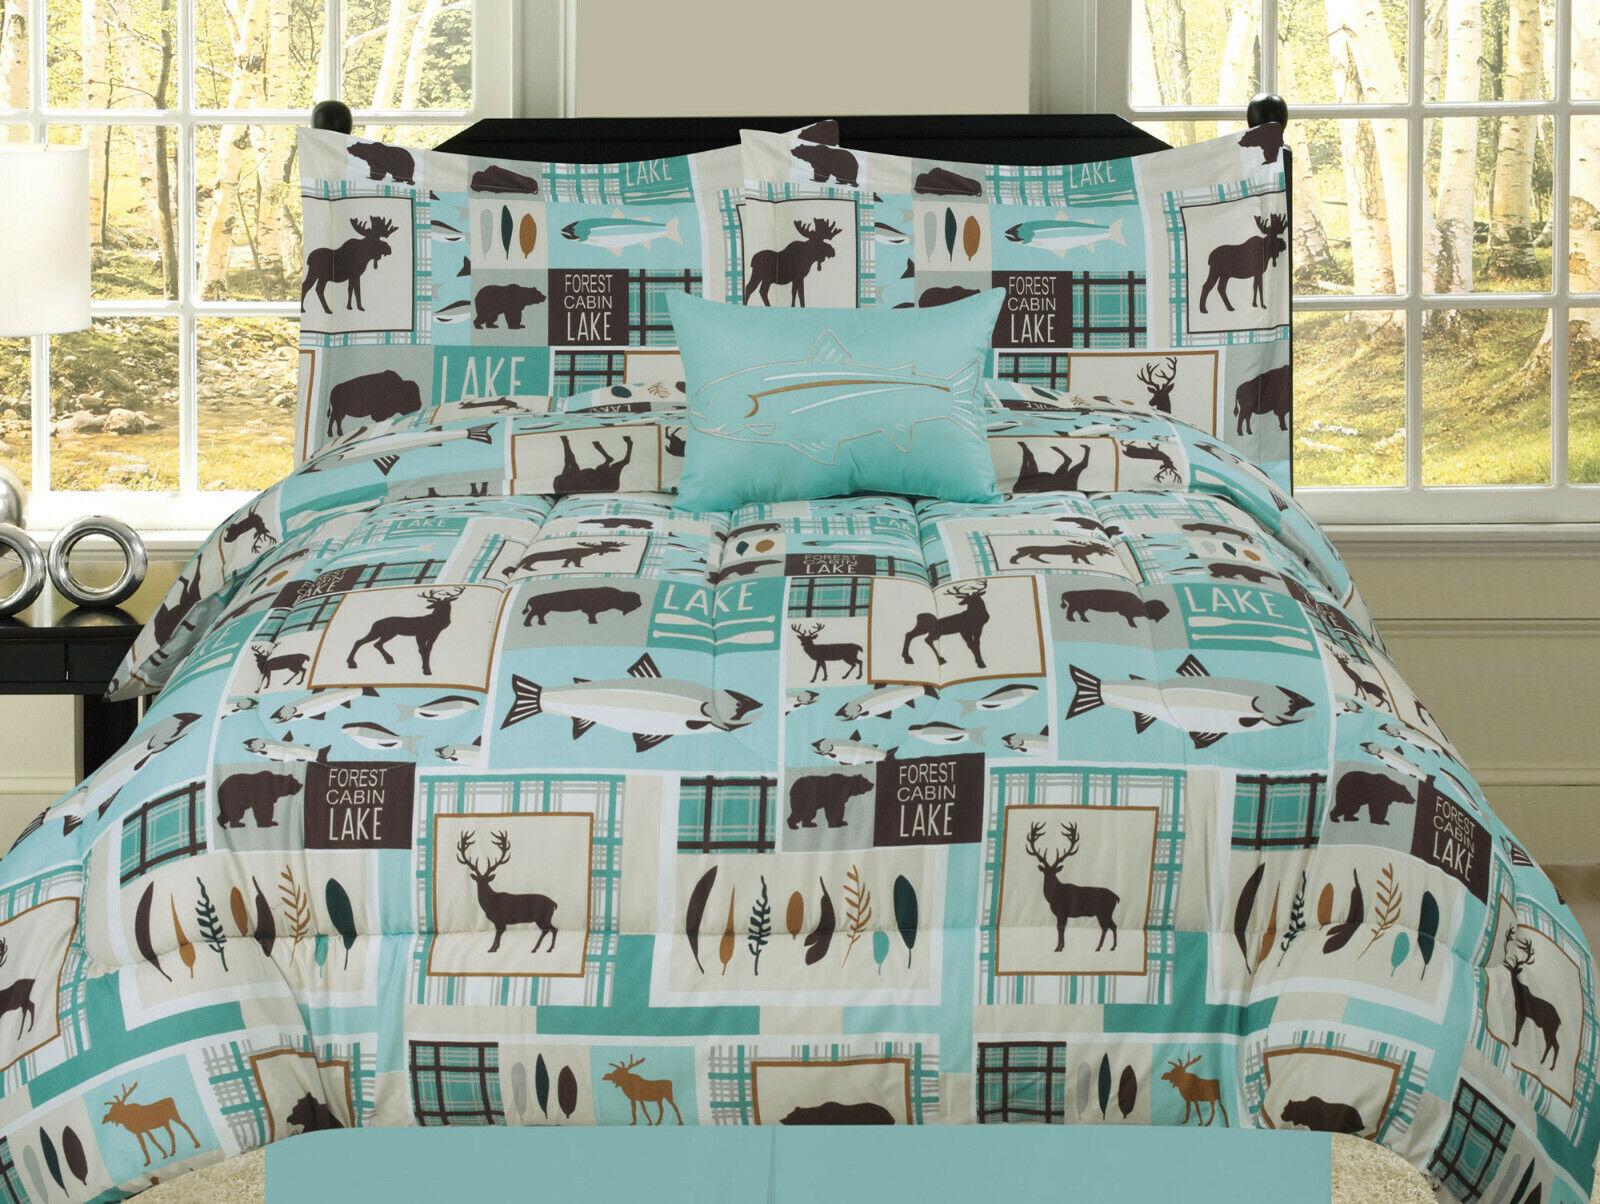 Fishing Lakehouse Cabin Lodge Comforter Bedding Set Bear Fish Deer Rustic, Blue Bedding